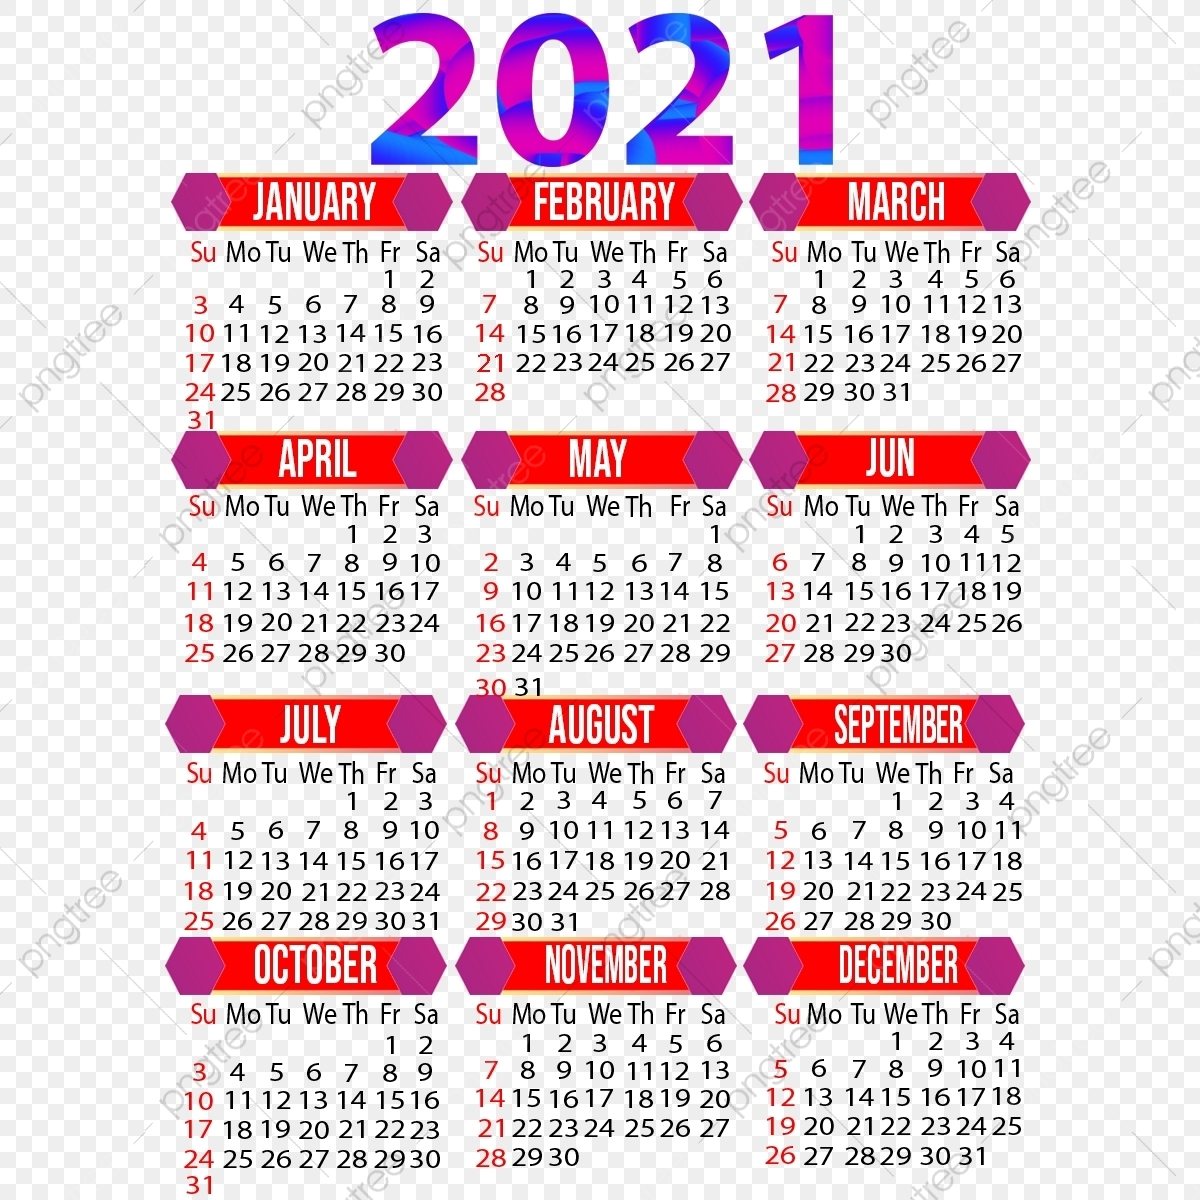 Pick Clip Art November Caendart 2021